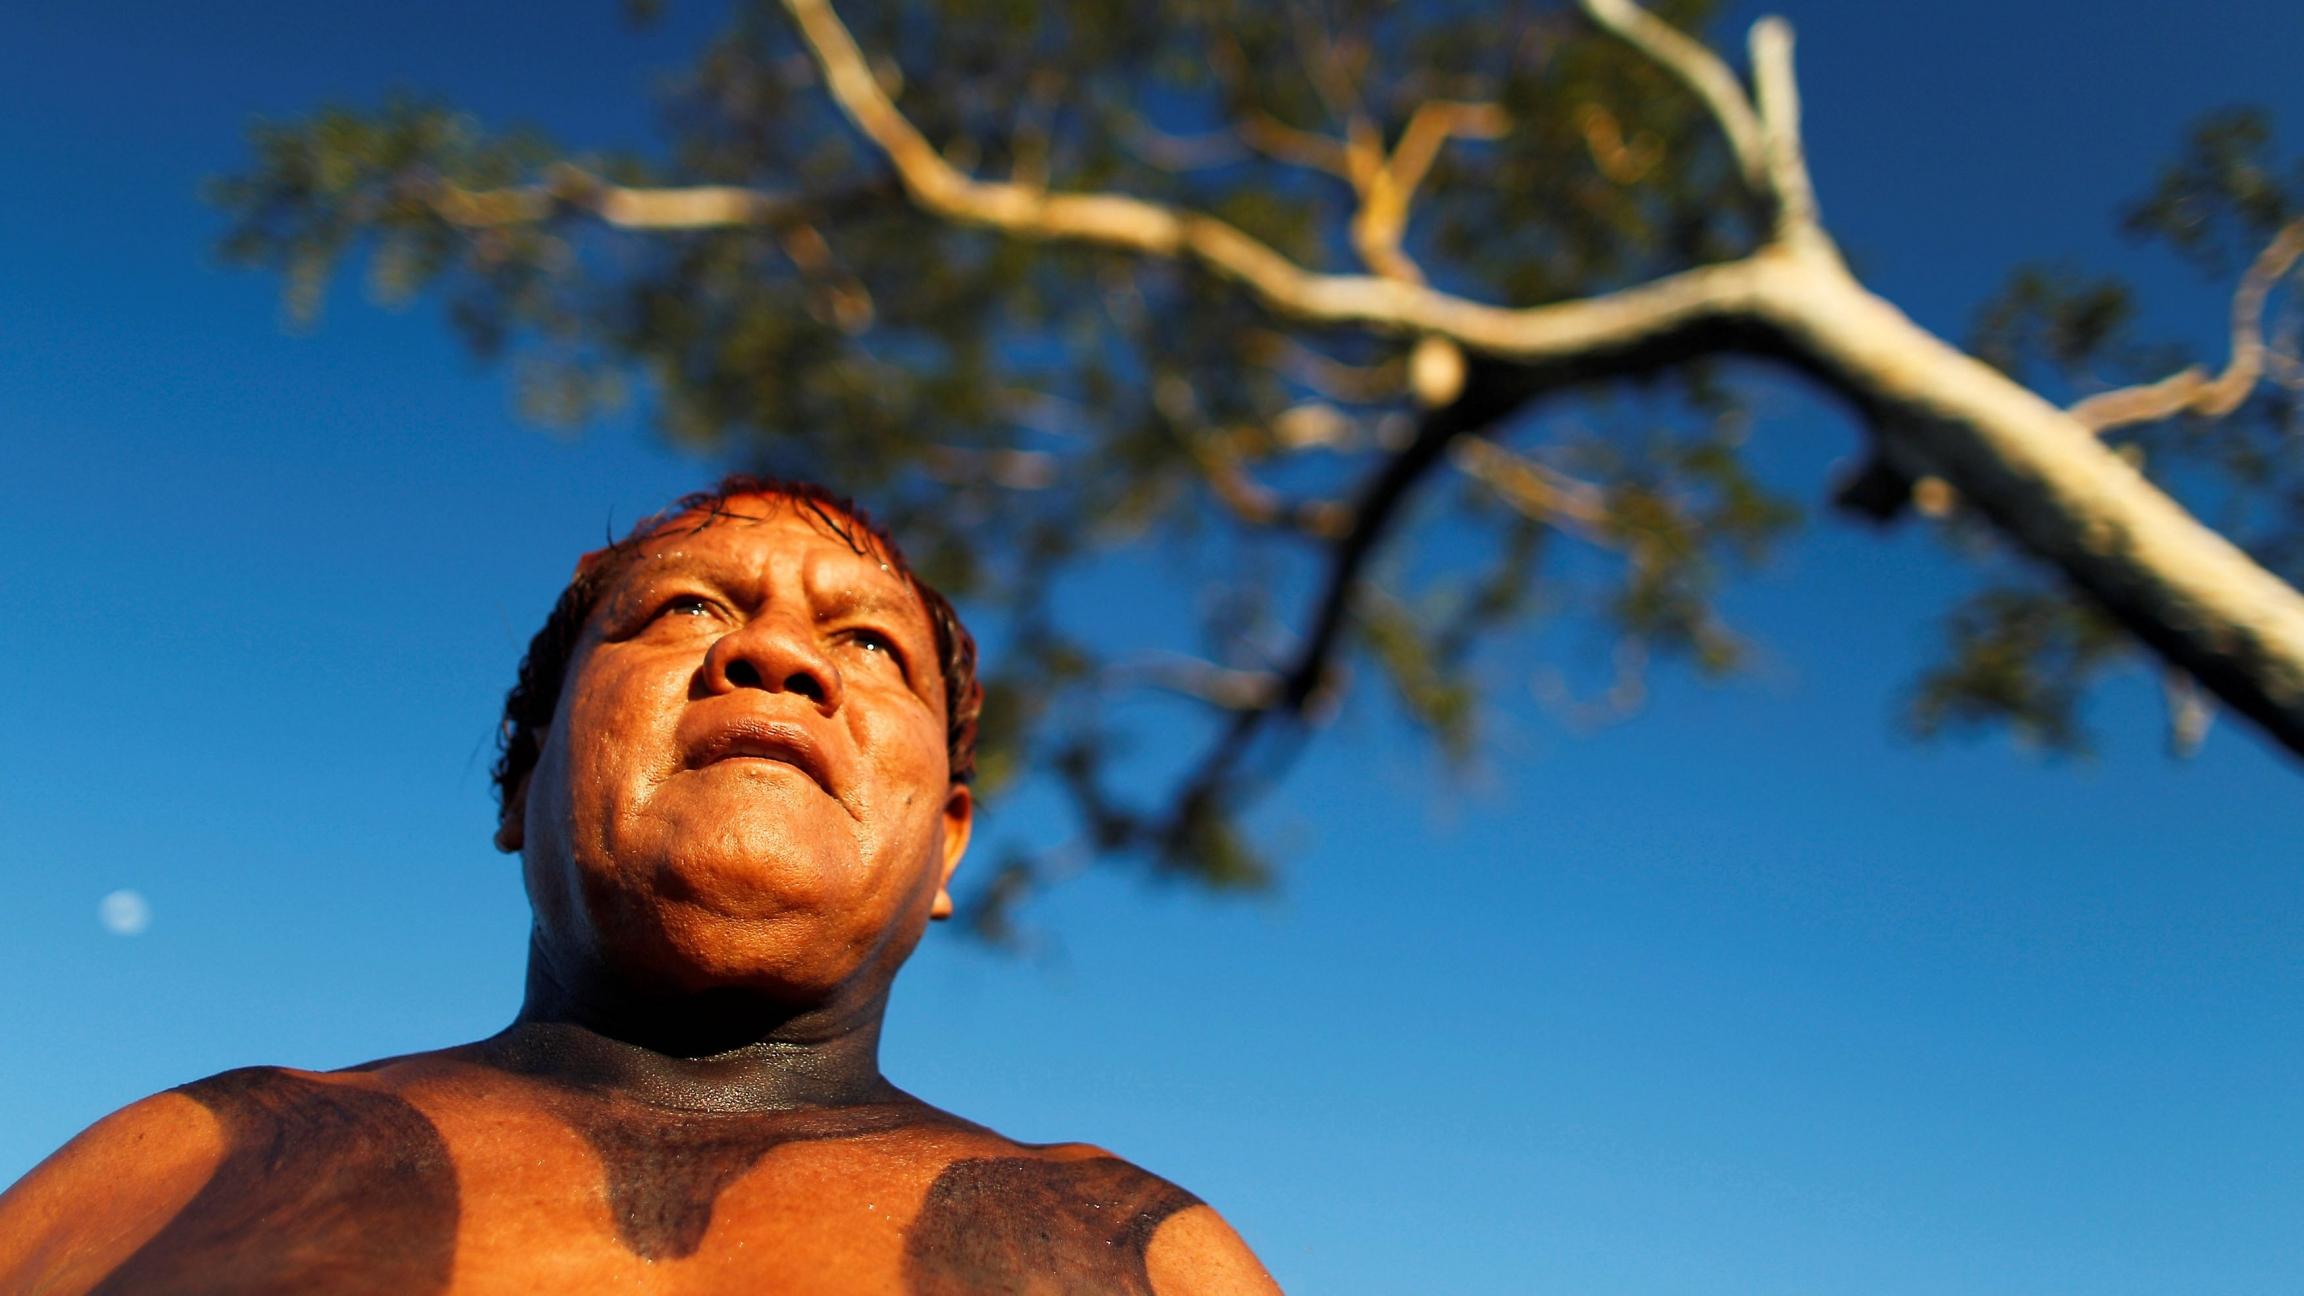 Yawalapiti ChiefAritanais seen in the Xingu National Park, Mato Grosso State, May 9, 2012.